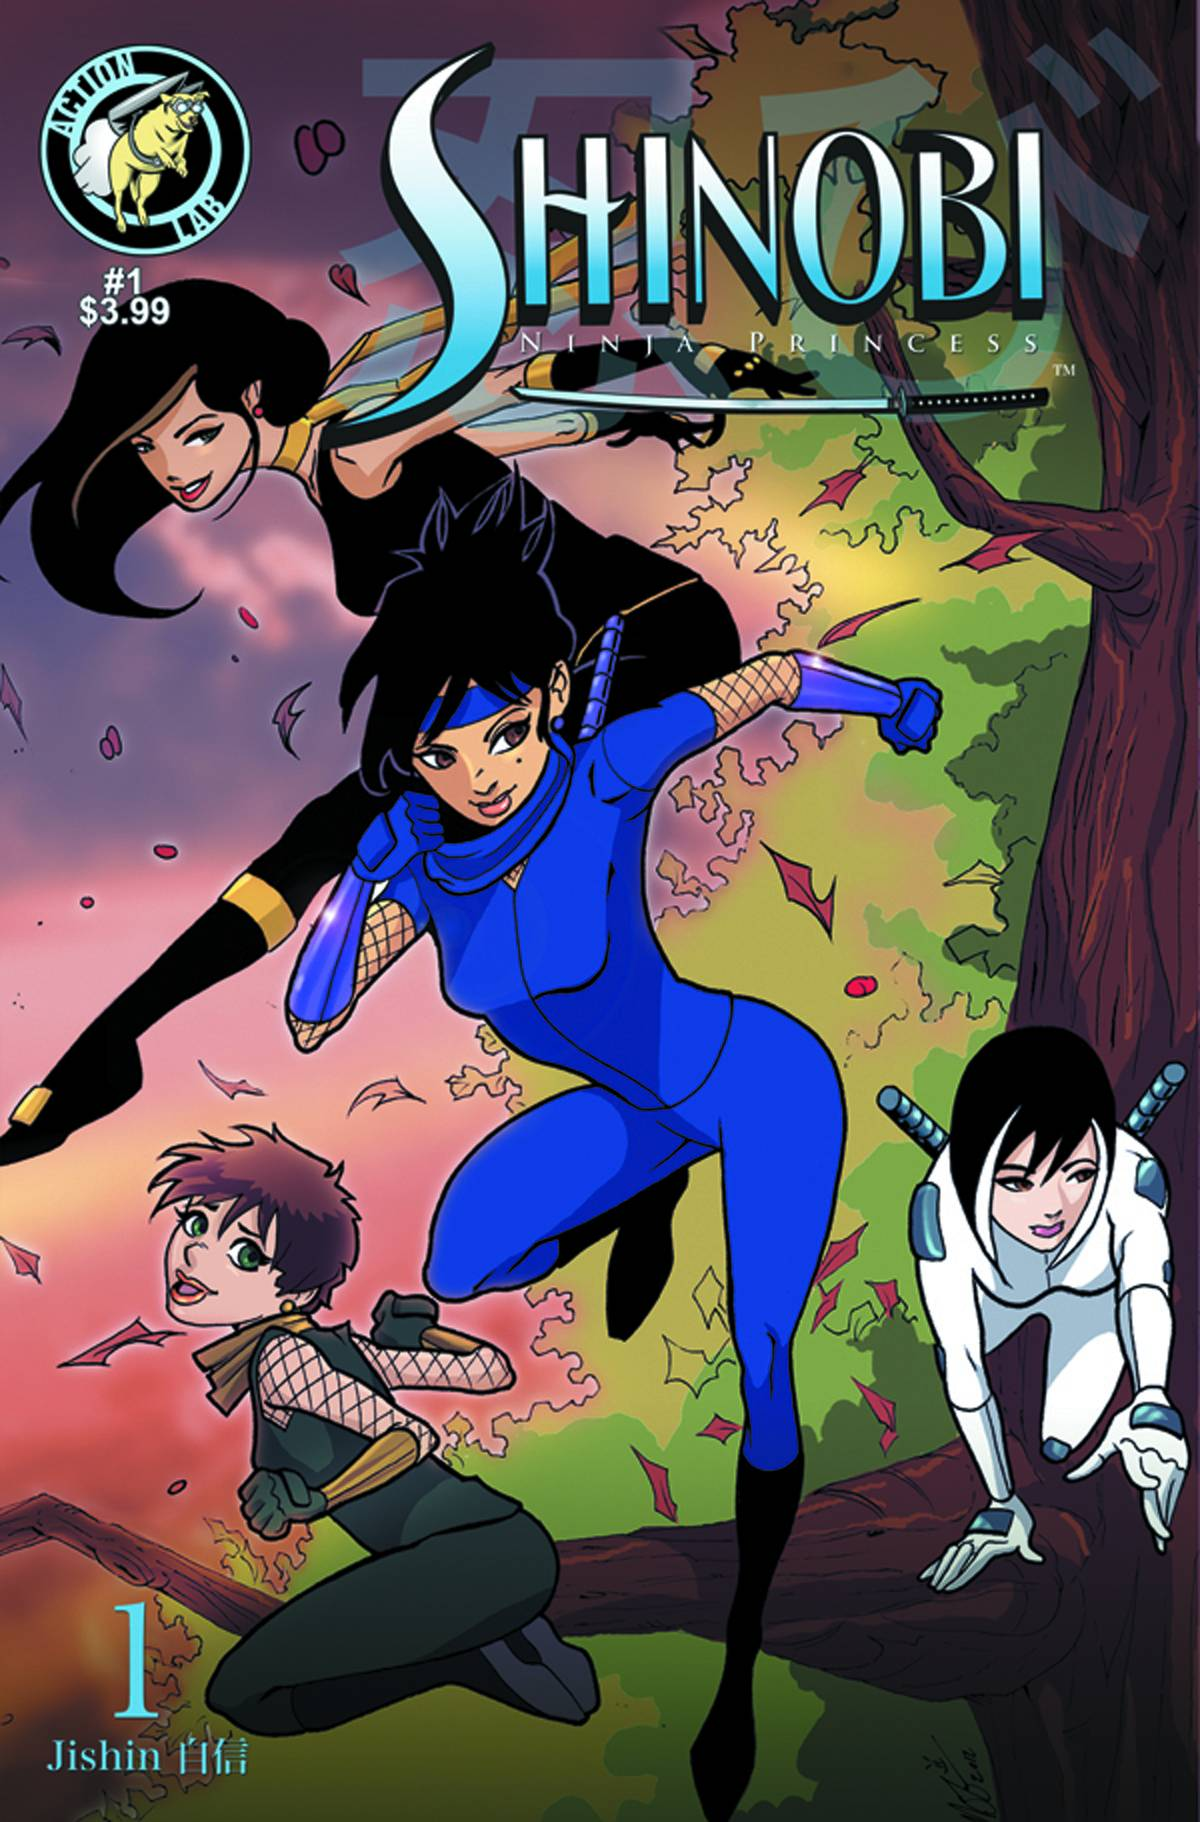 Free Animated Fall Wallpaper Shinobi Ninja Princess From Action Labs Home Of